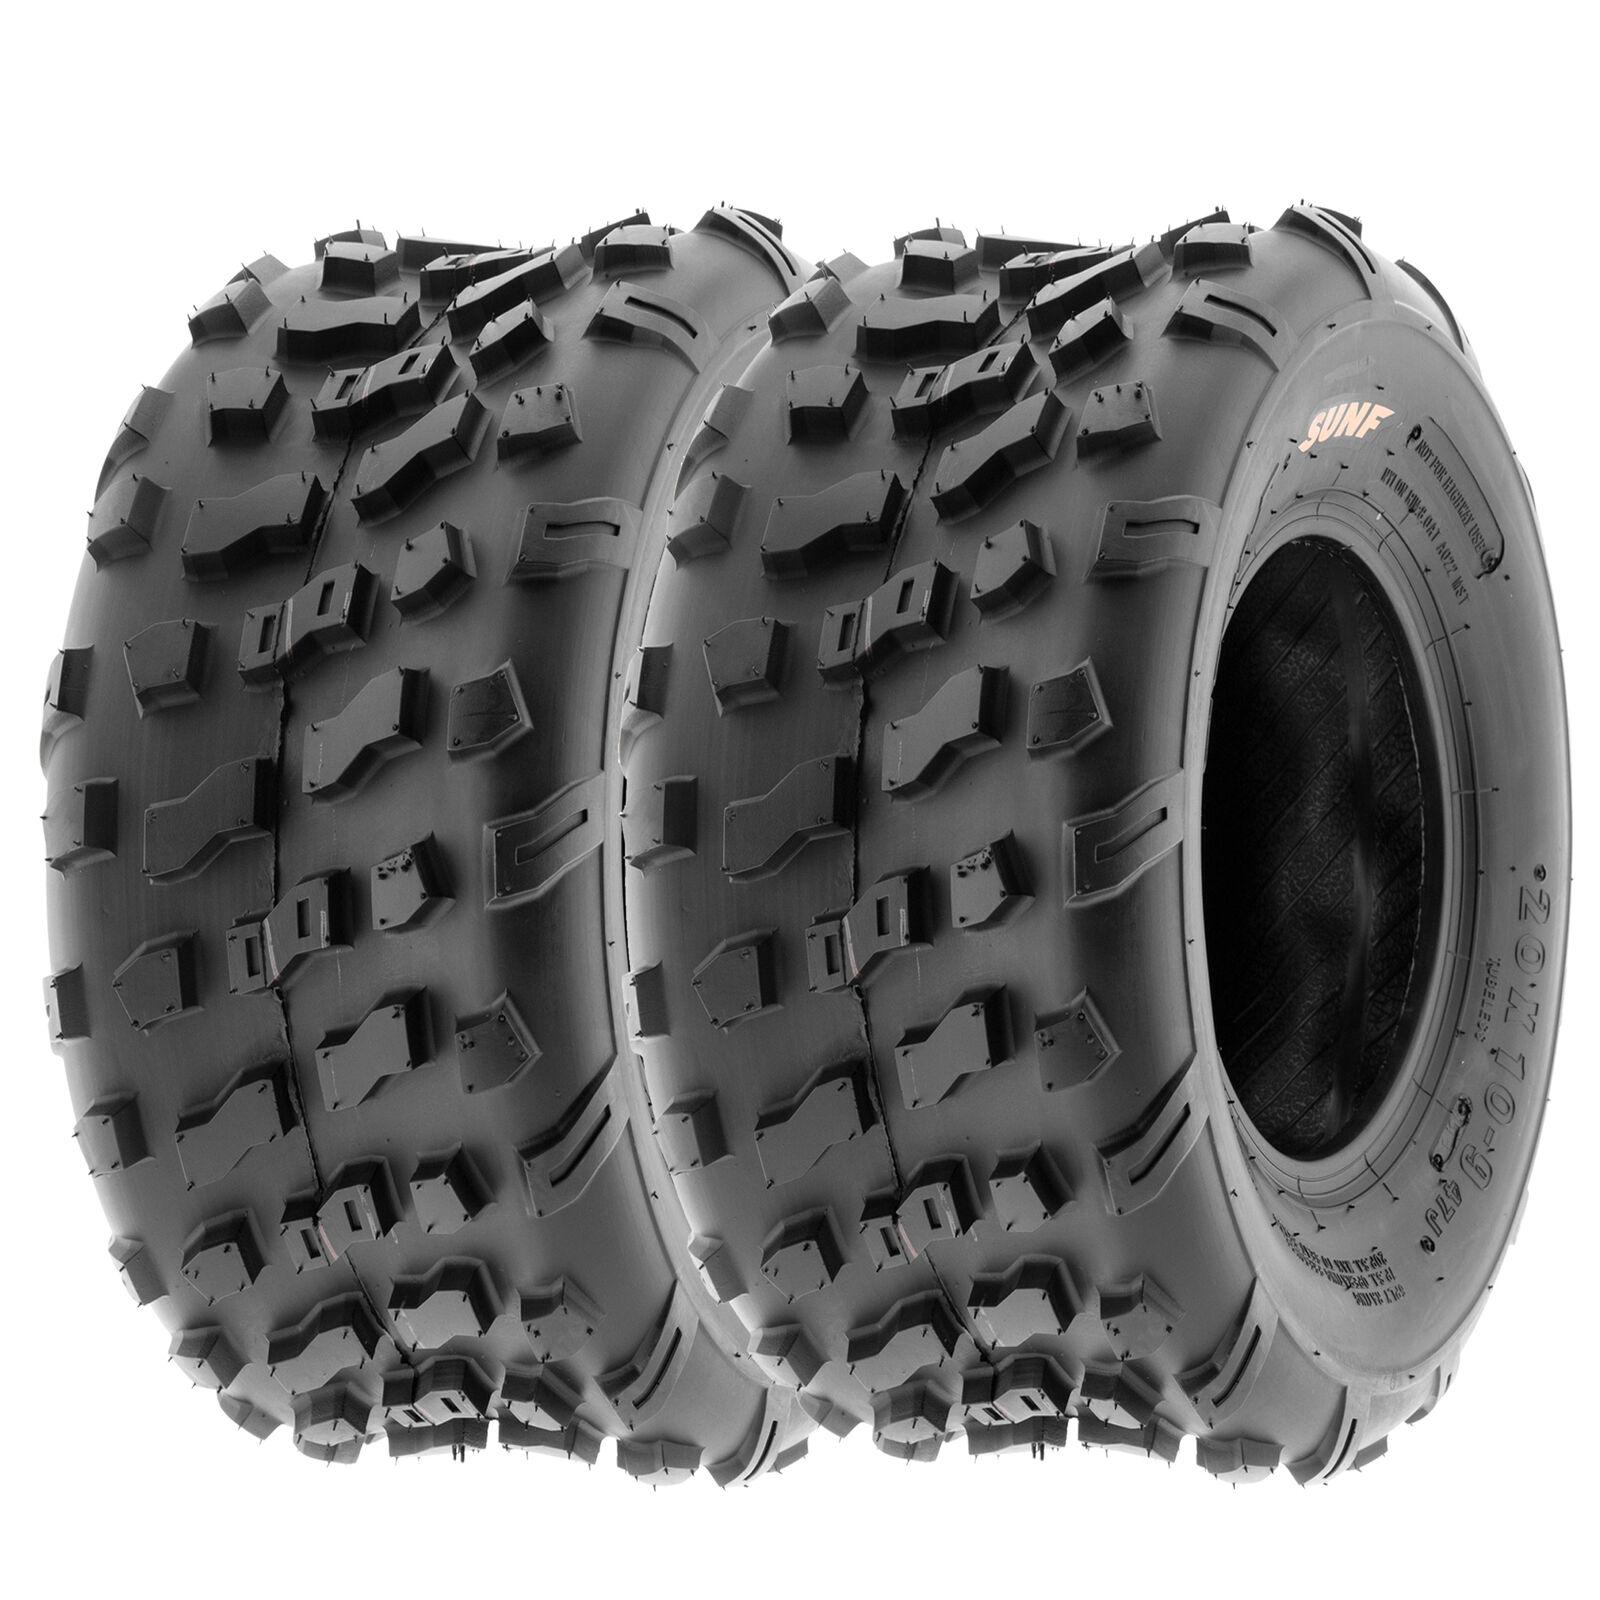 20x7 20-7-8 20x7x8 20x7-8 Kenda Max A//T K284 Front ATV Tire 2 Ply